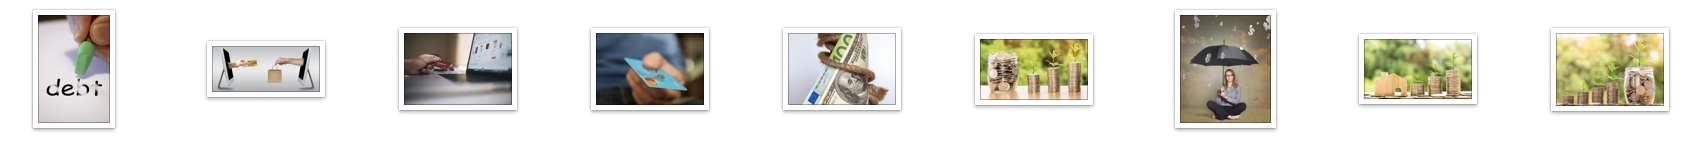 DebtSnowballPLR-RoyaltyFreeImages2